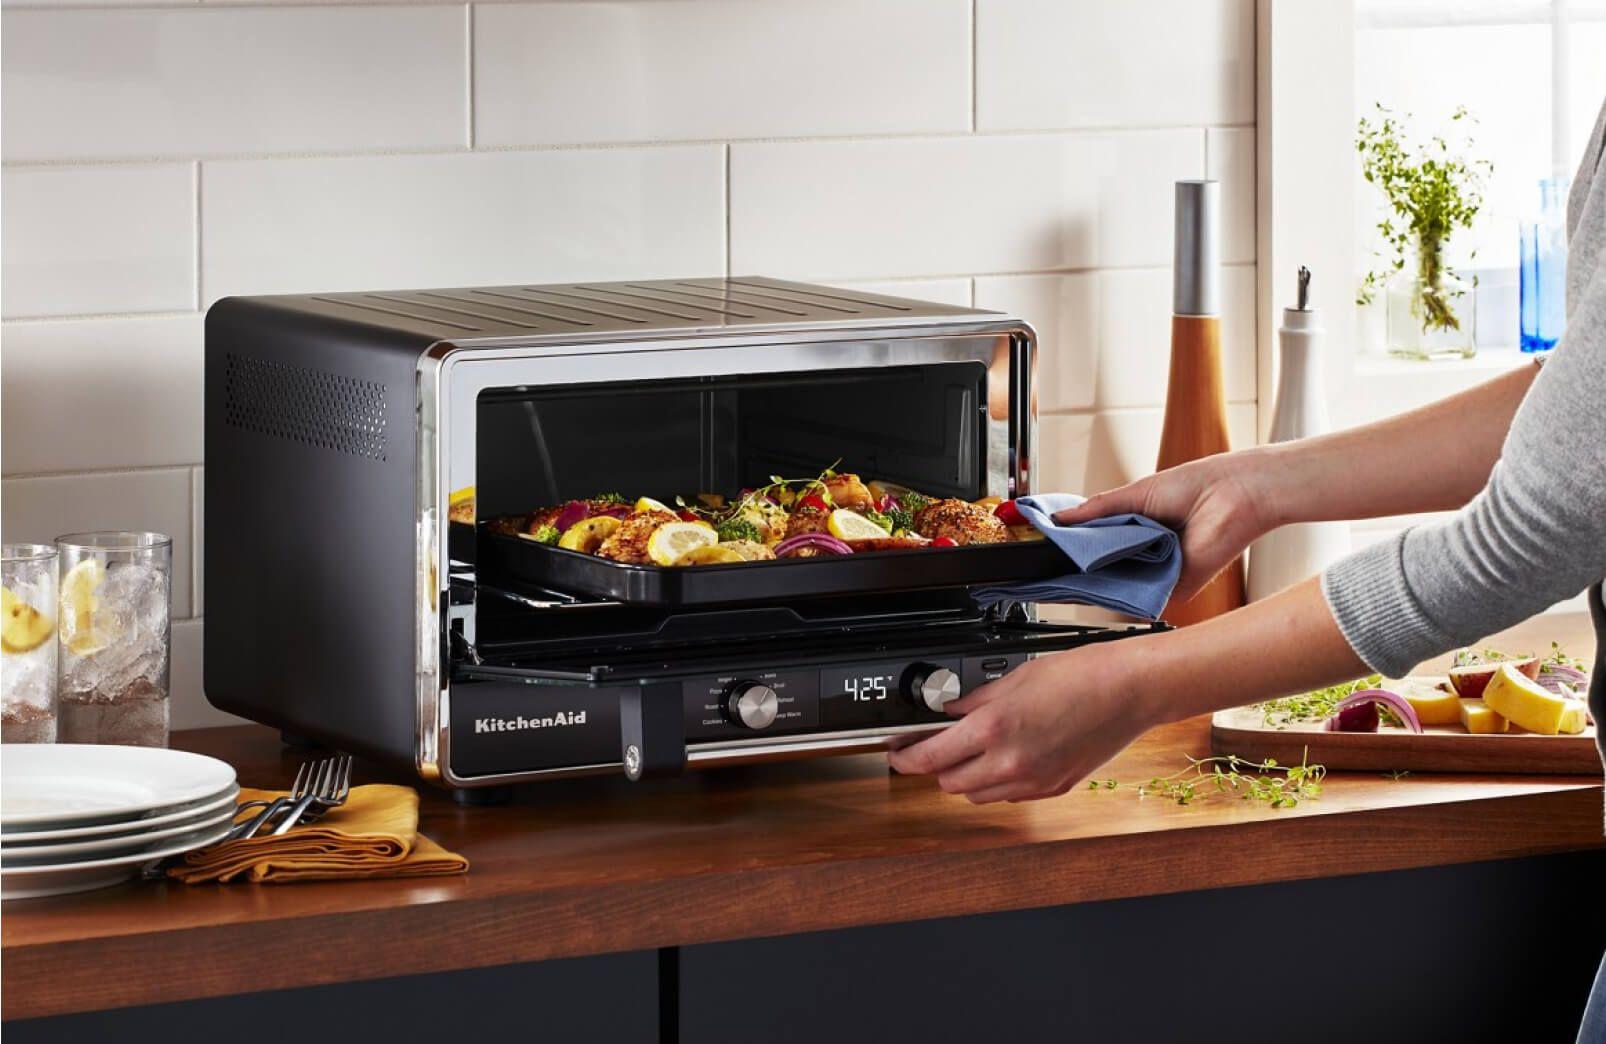 A KitchenAid® Digital Countertop Oven roasting vegetables.